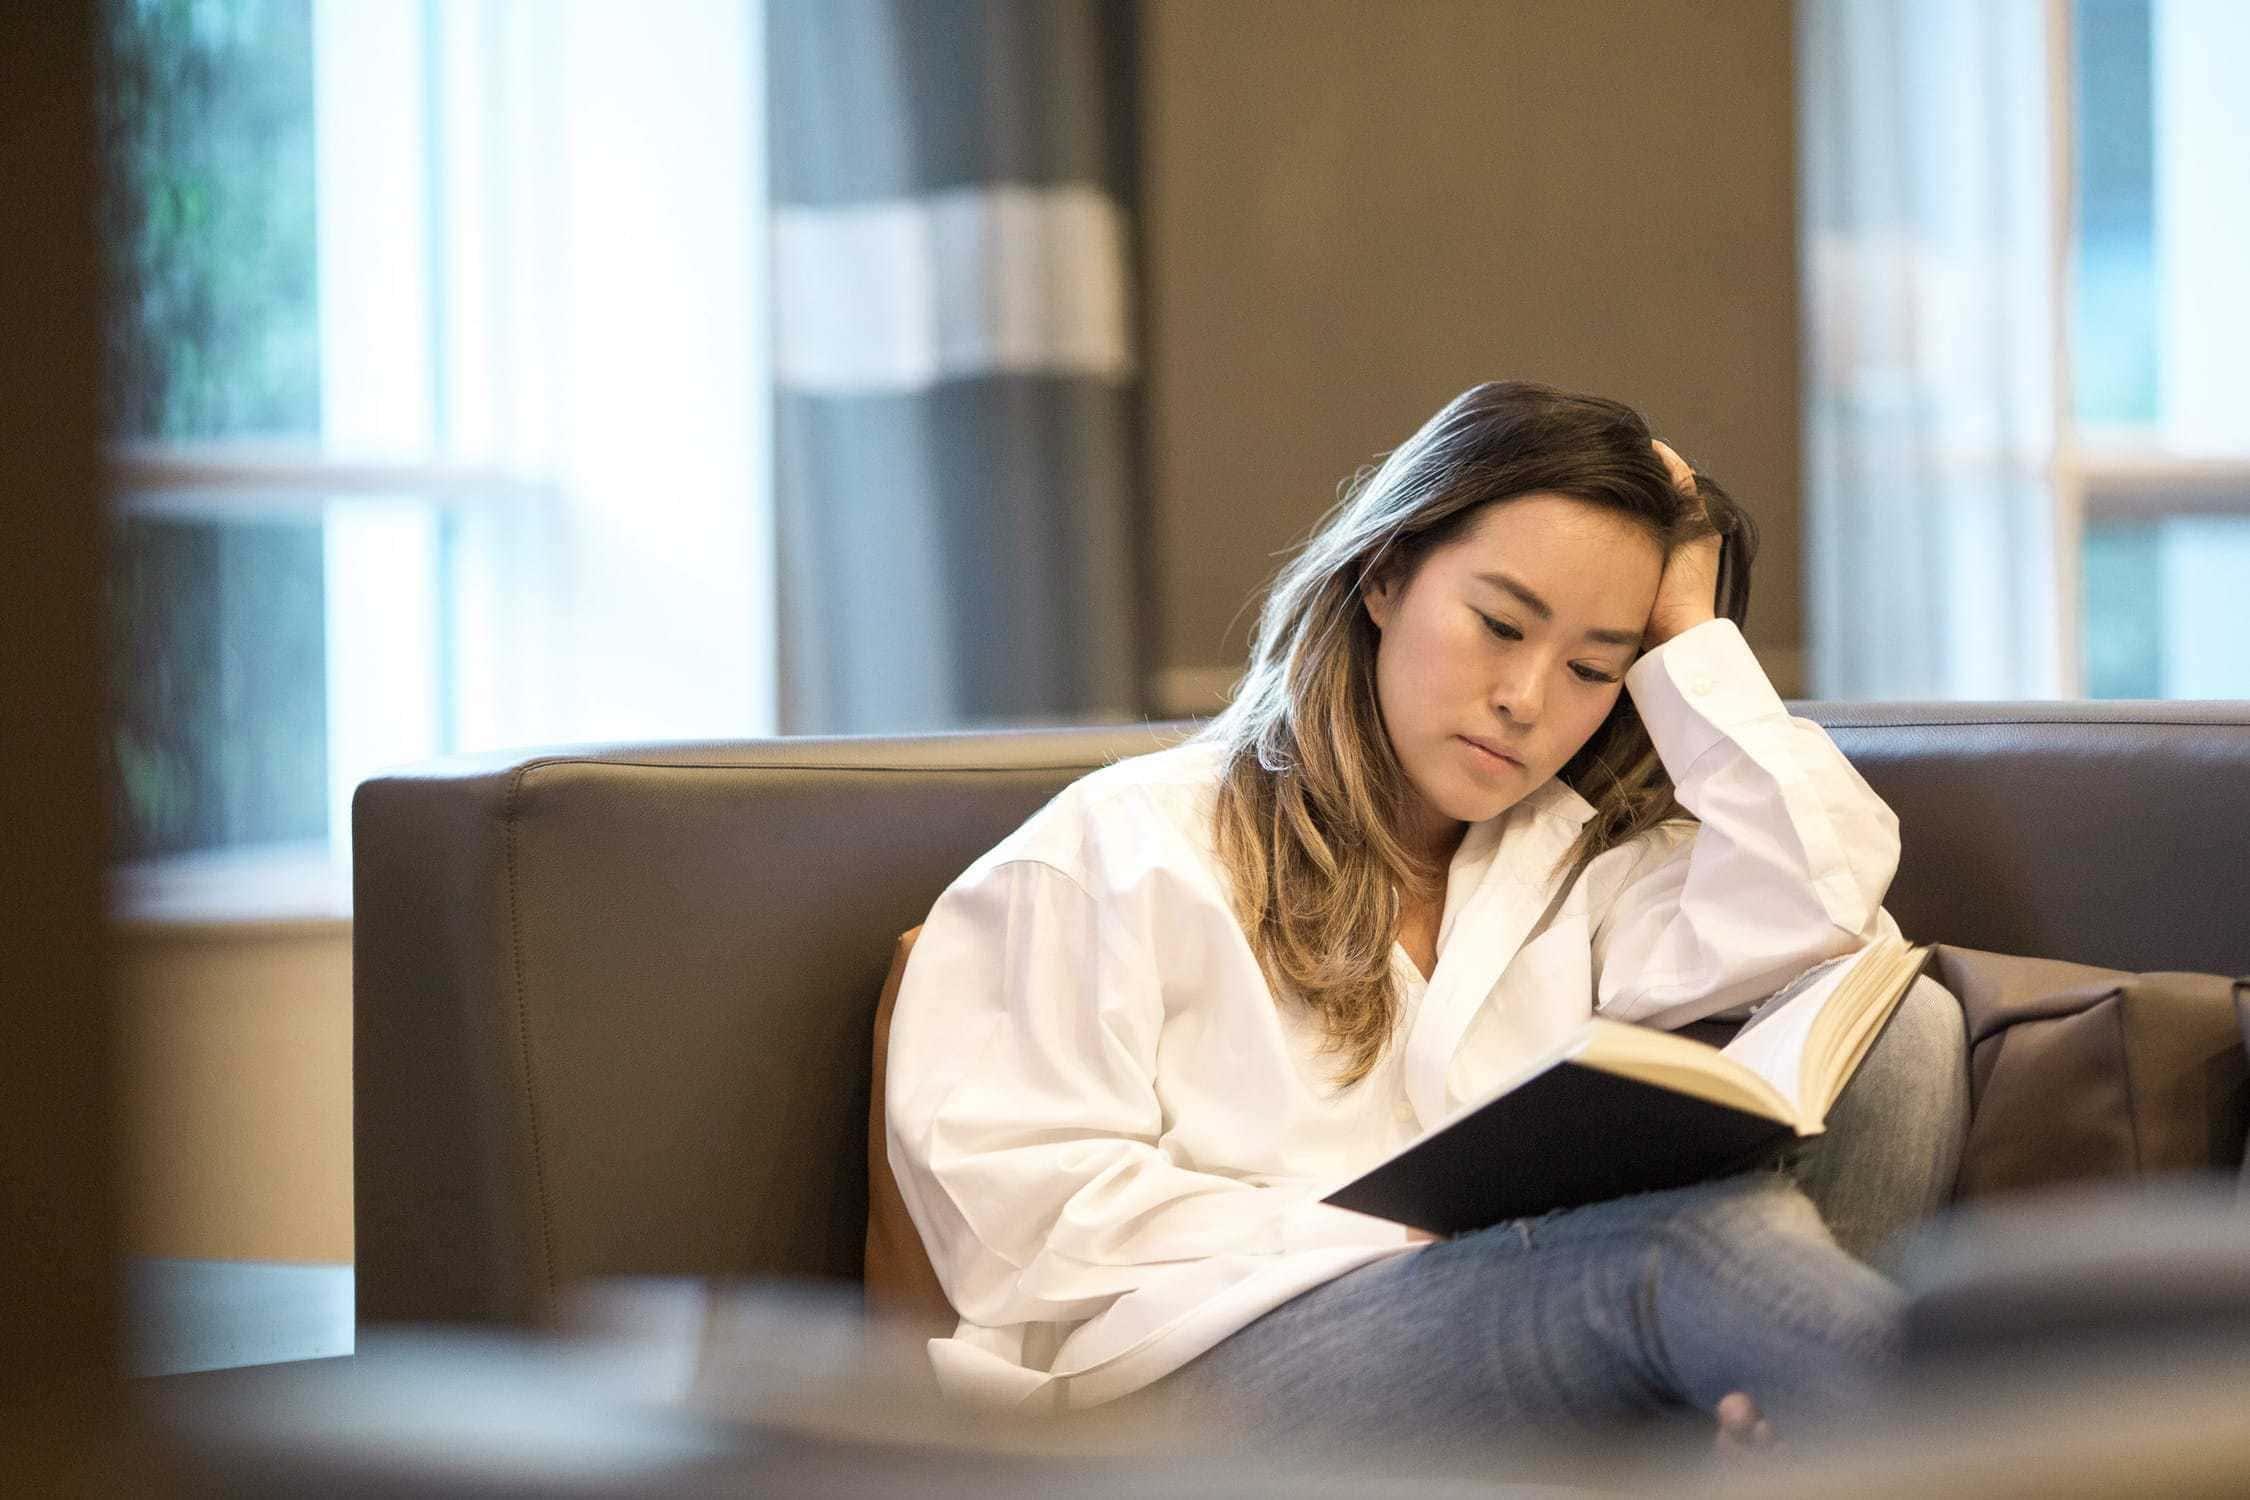 volunteerism voluntourism ethical volunteering harm good reading book